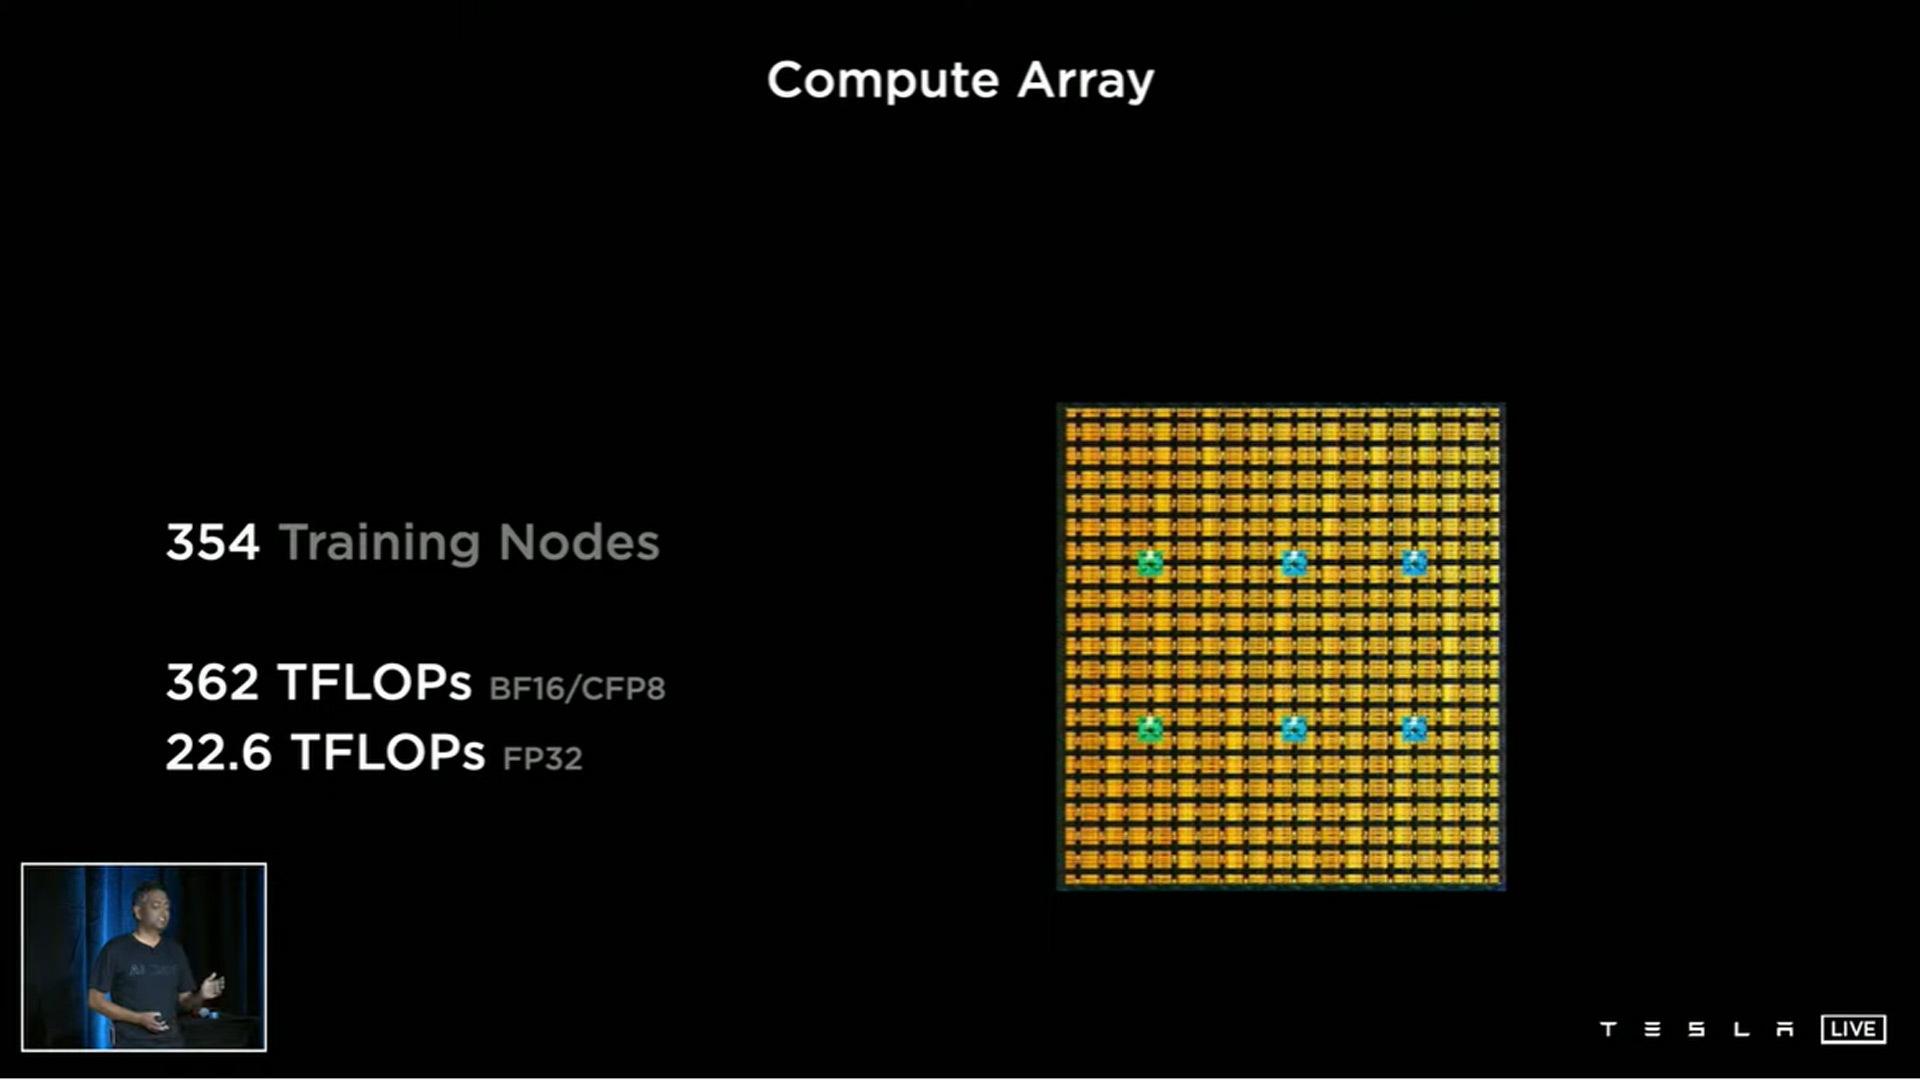 Tesla D1 microchip for Dojo neural network training computer